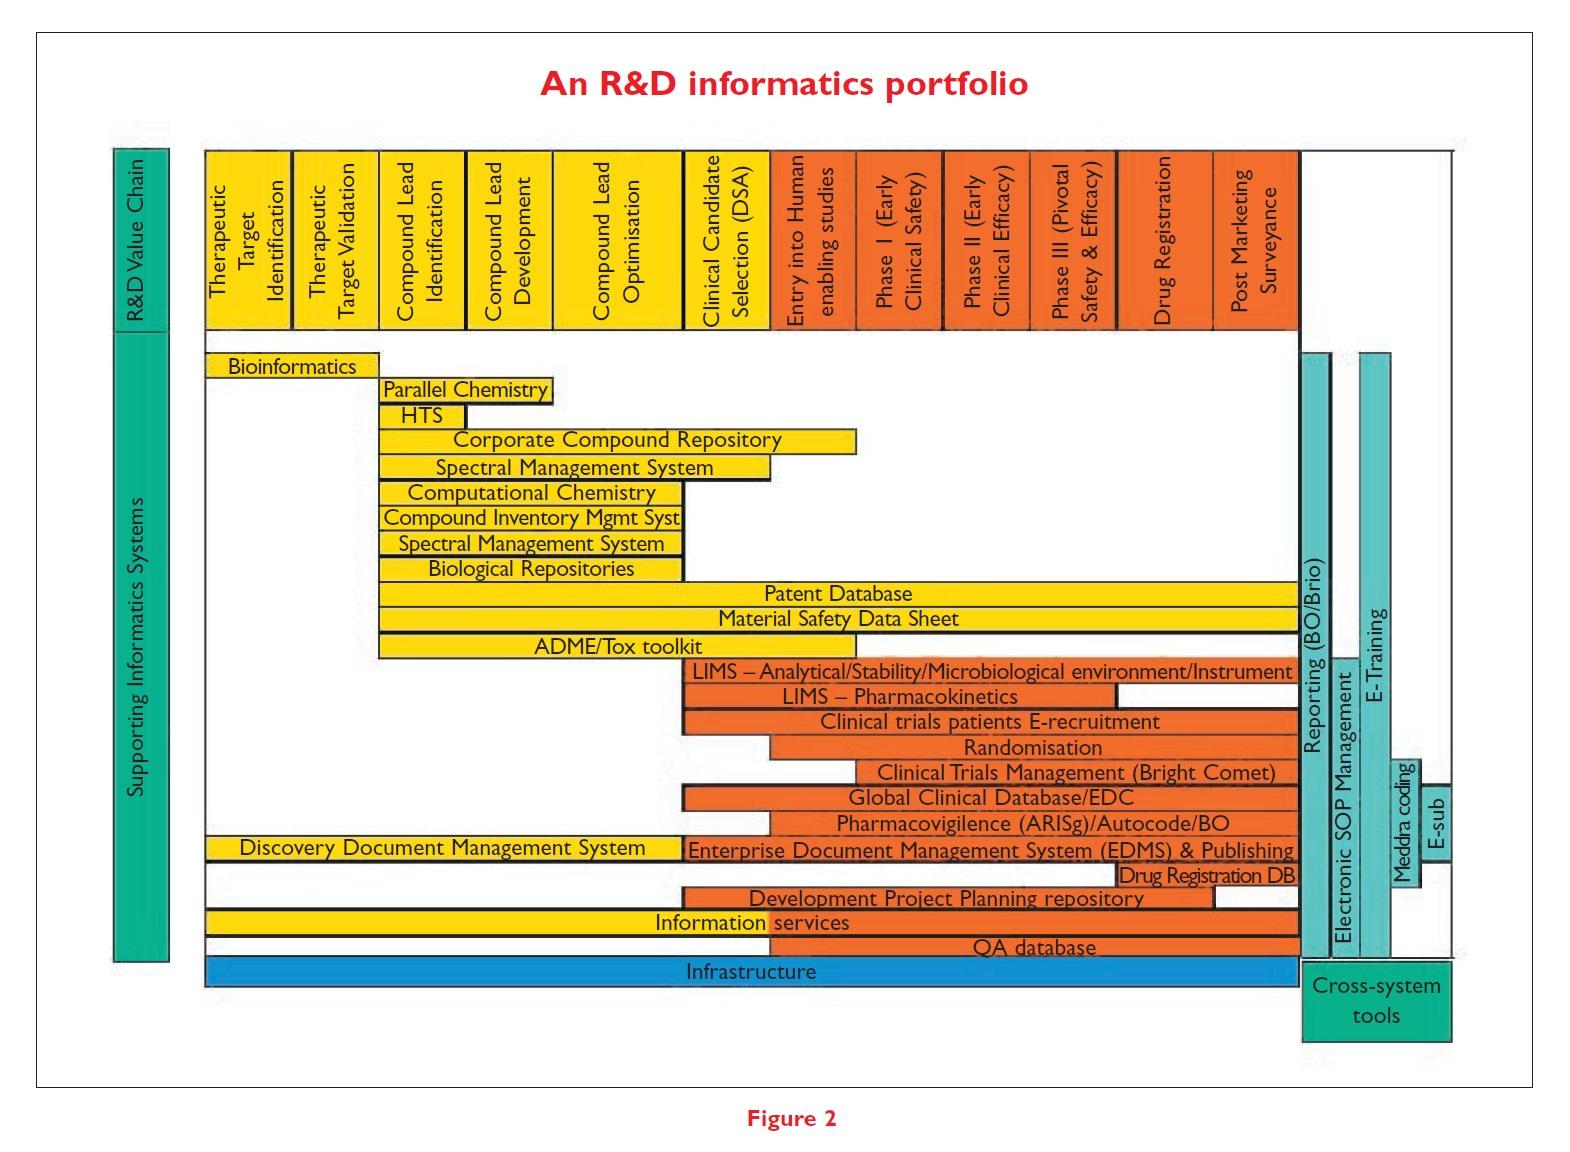 Figure 2 An R&D informatics portfolio